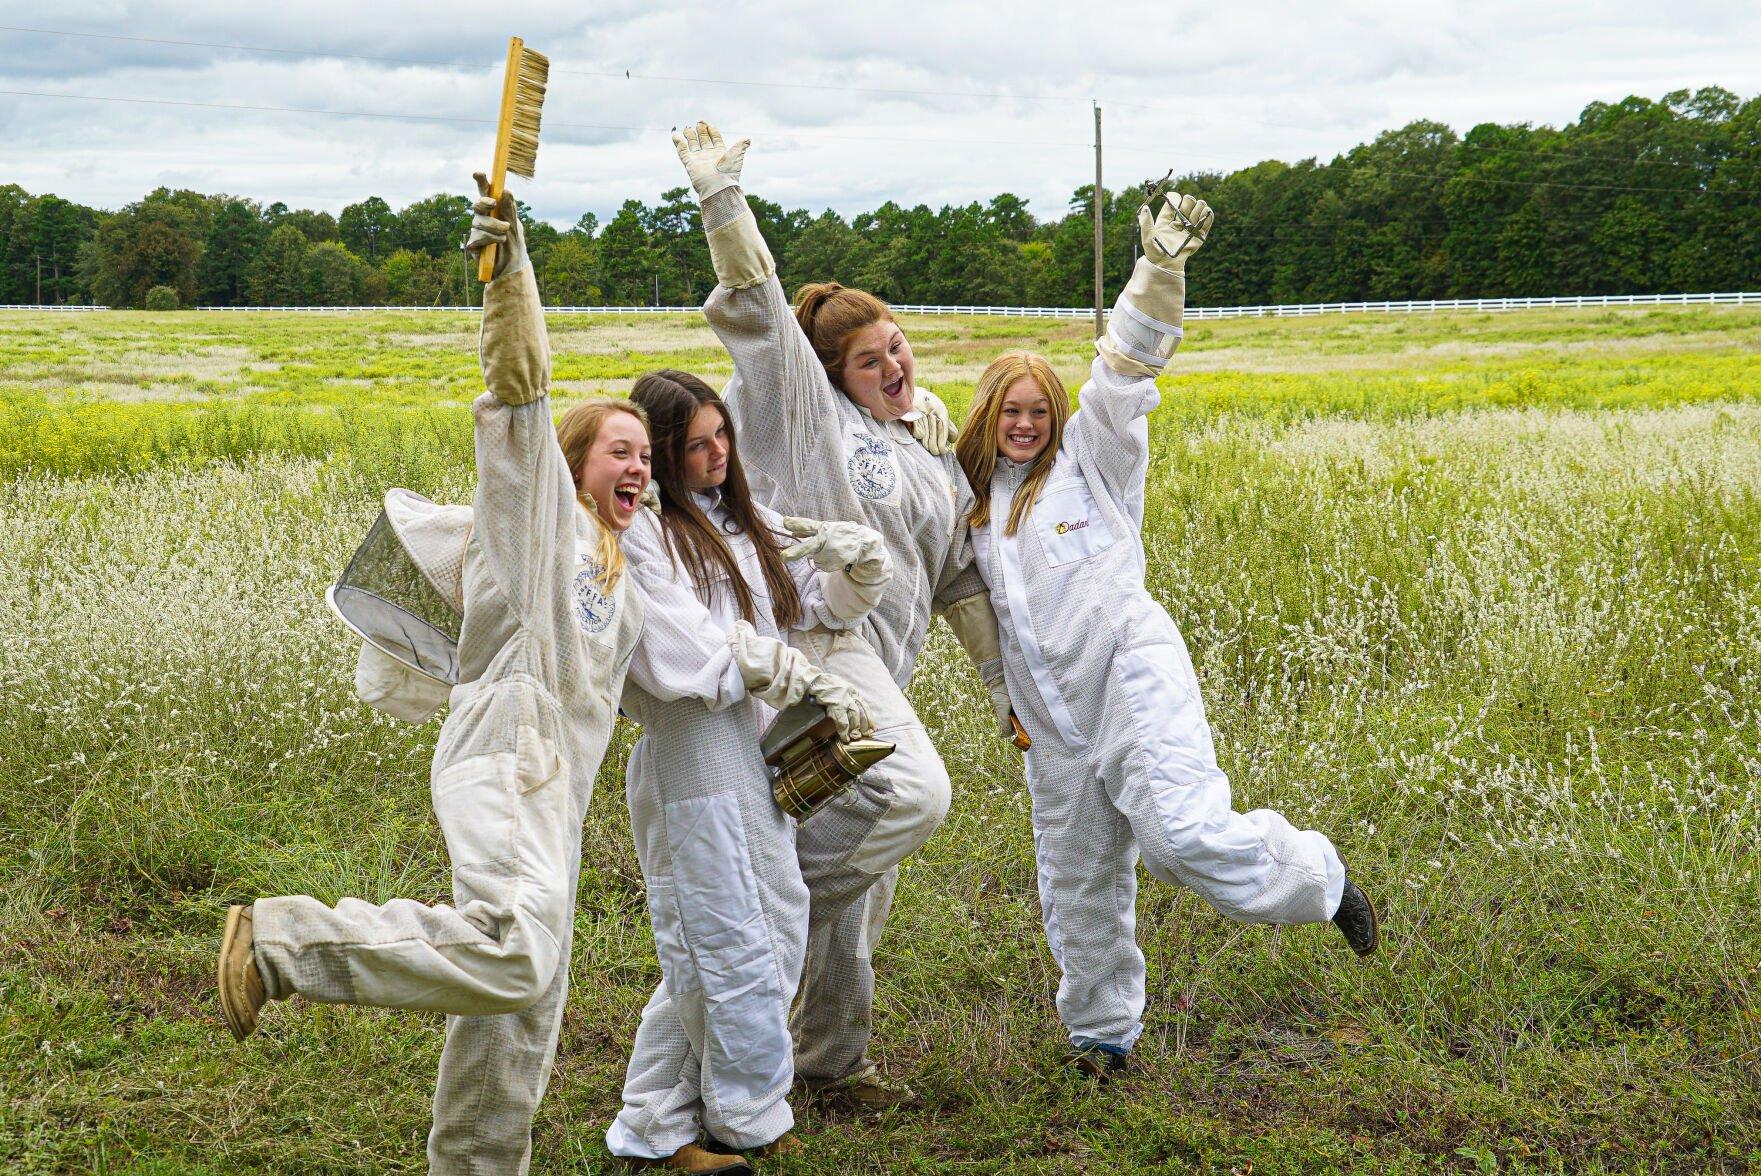 Hawkins 4G Honey team continues beekeeping operation, triples honey production at Ozarka amid COVID-19 shutdowns